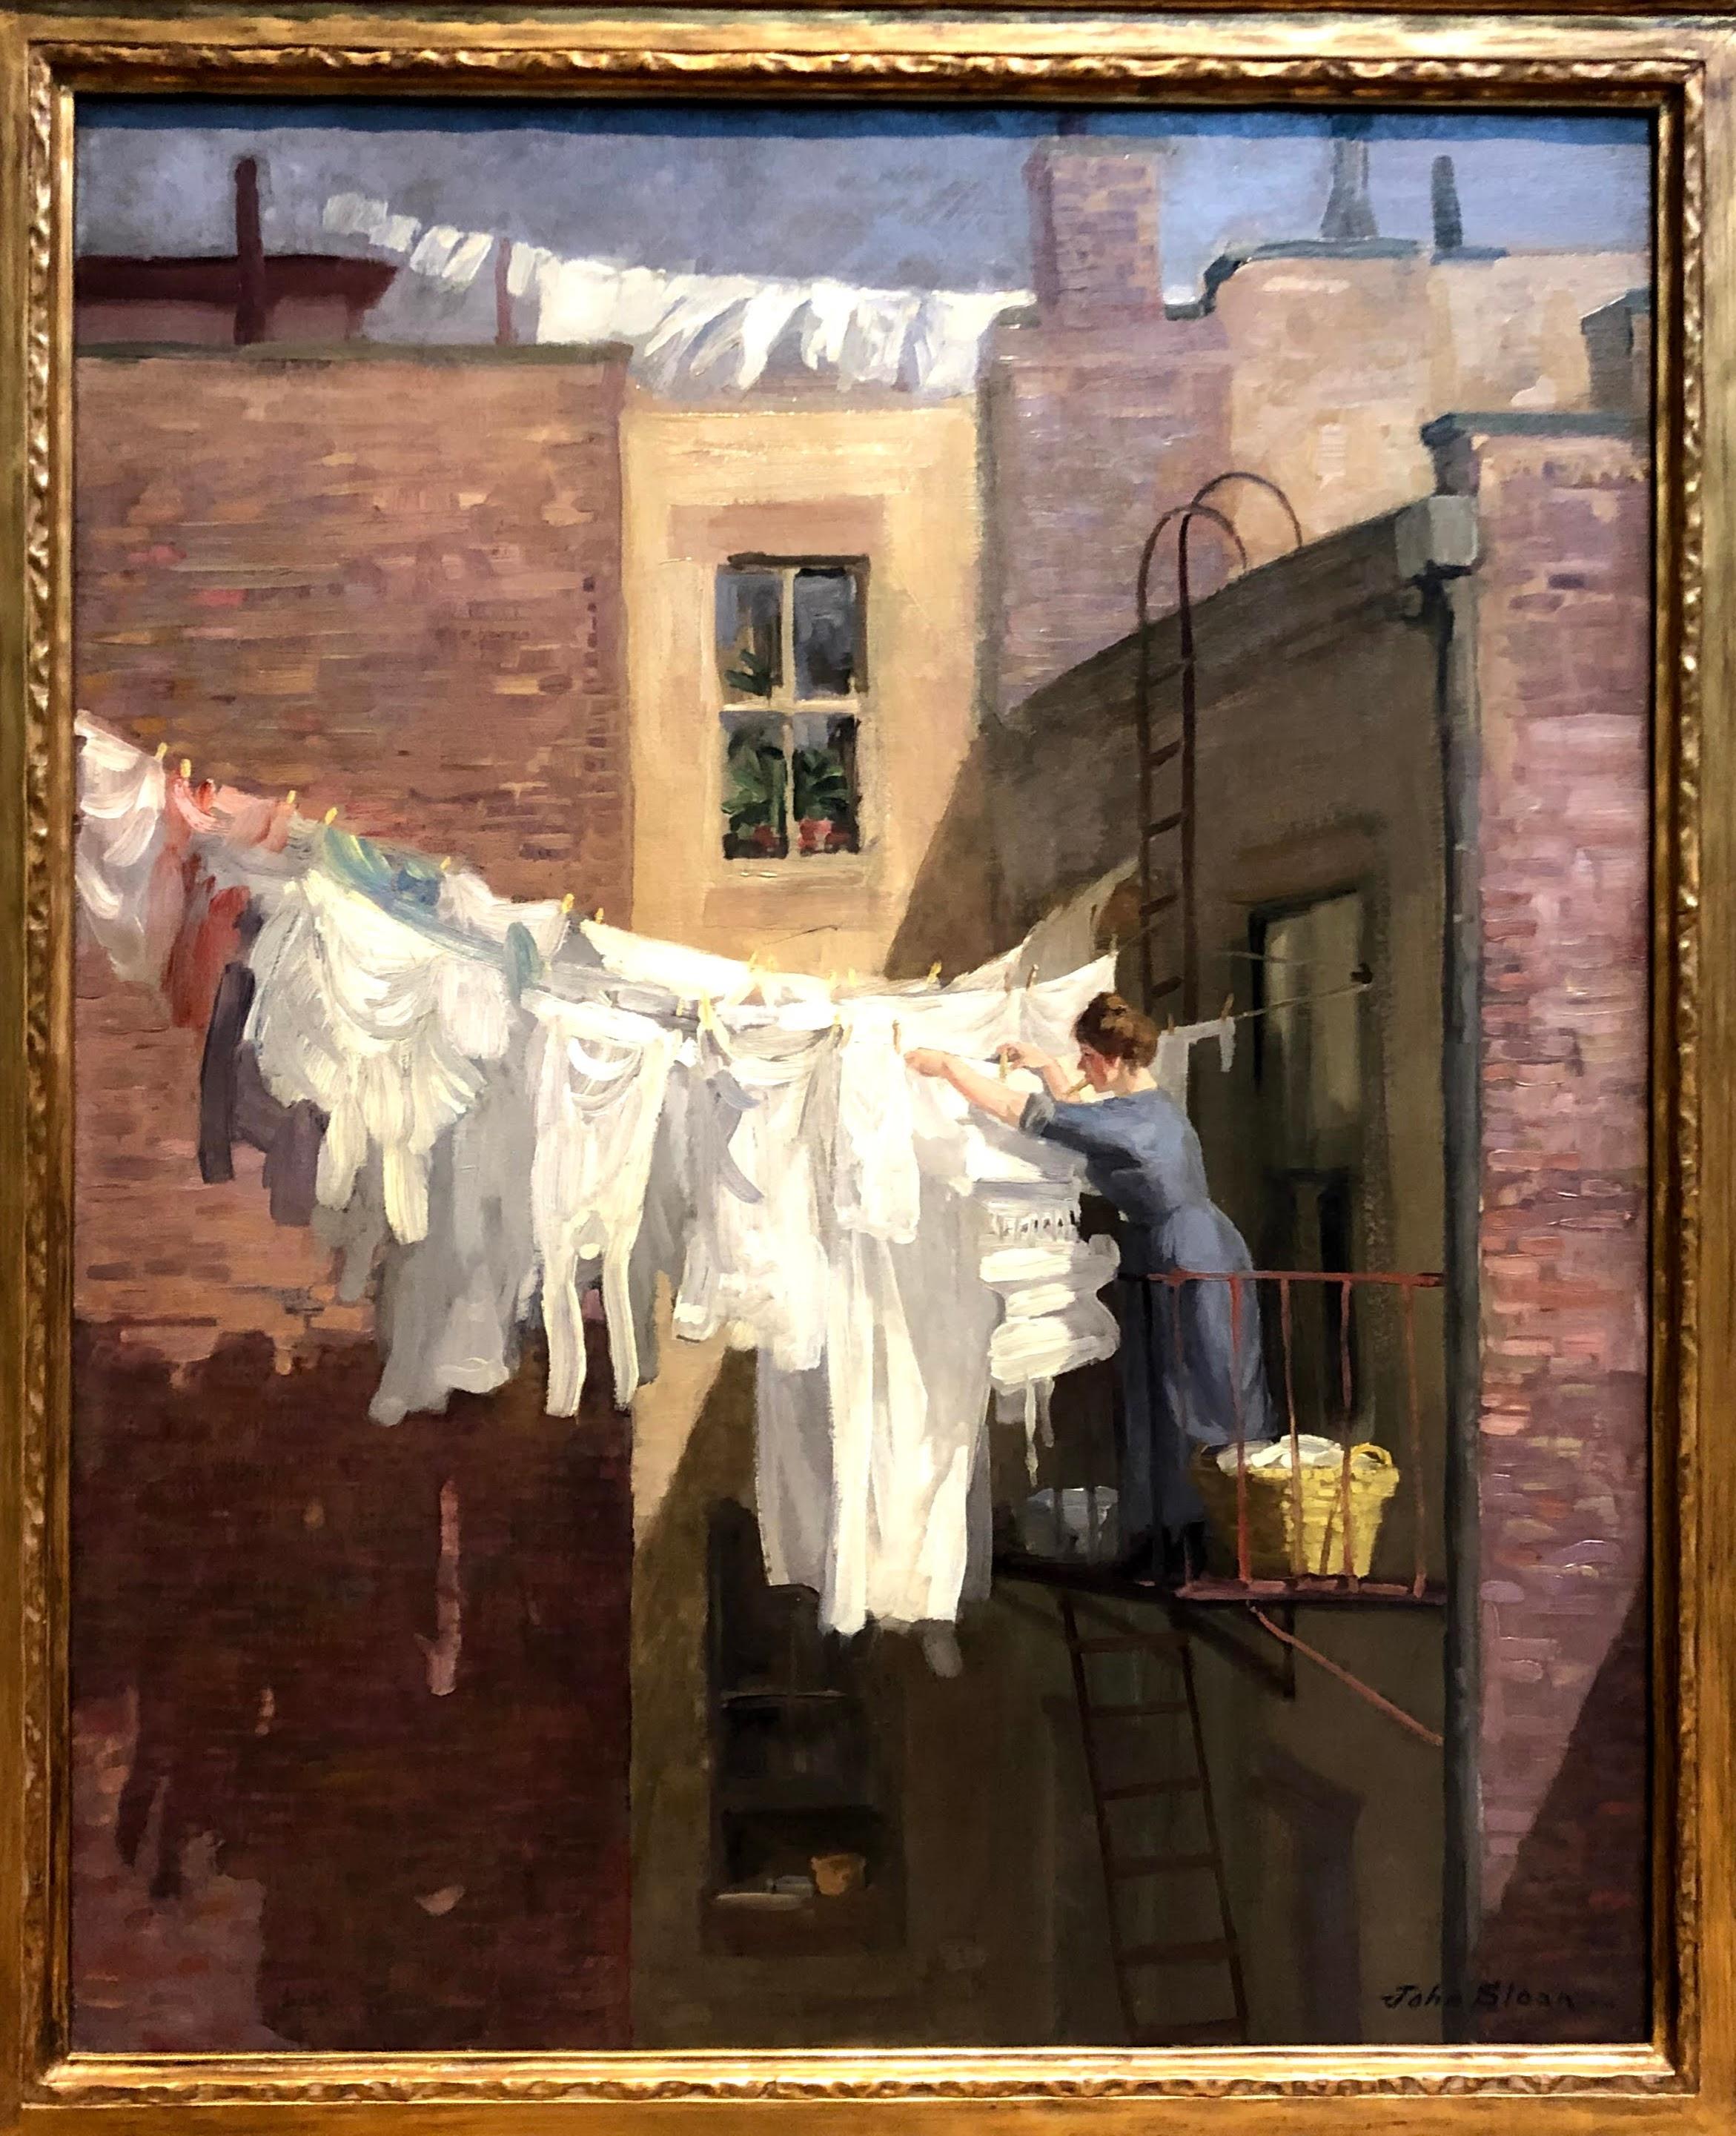 A Woman's Work, John Sloan